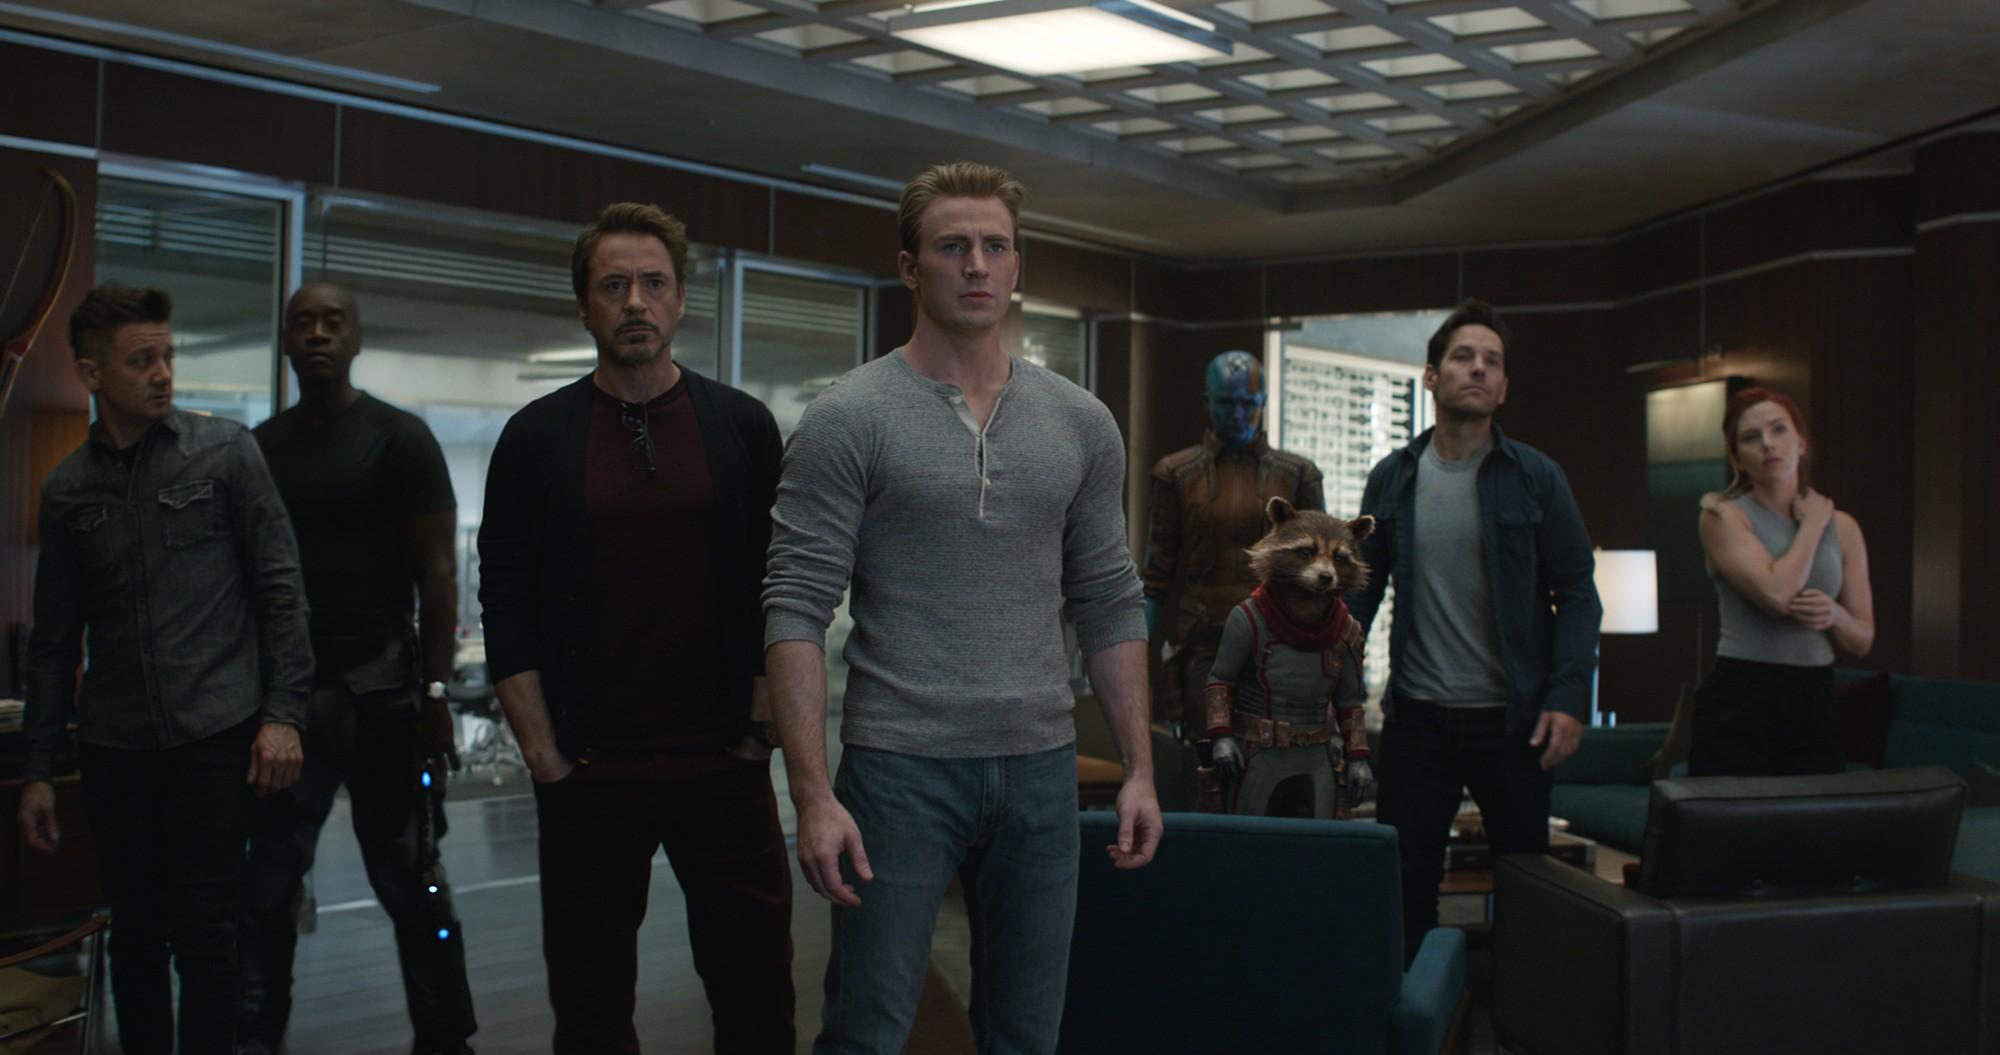 Spoiler warning: The Avengers: Endgame there is a shark figure as a joke? - Photo 7.